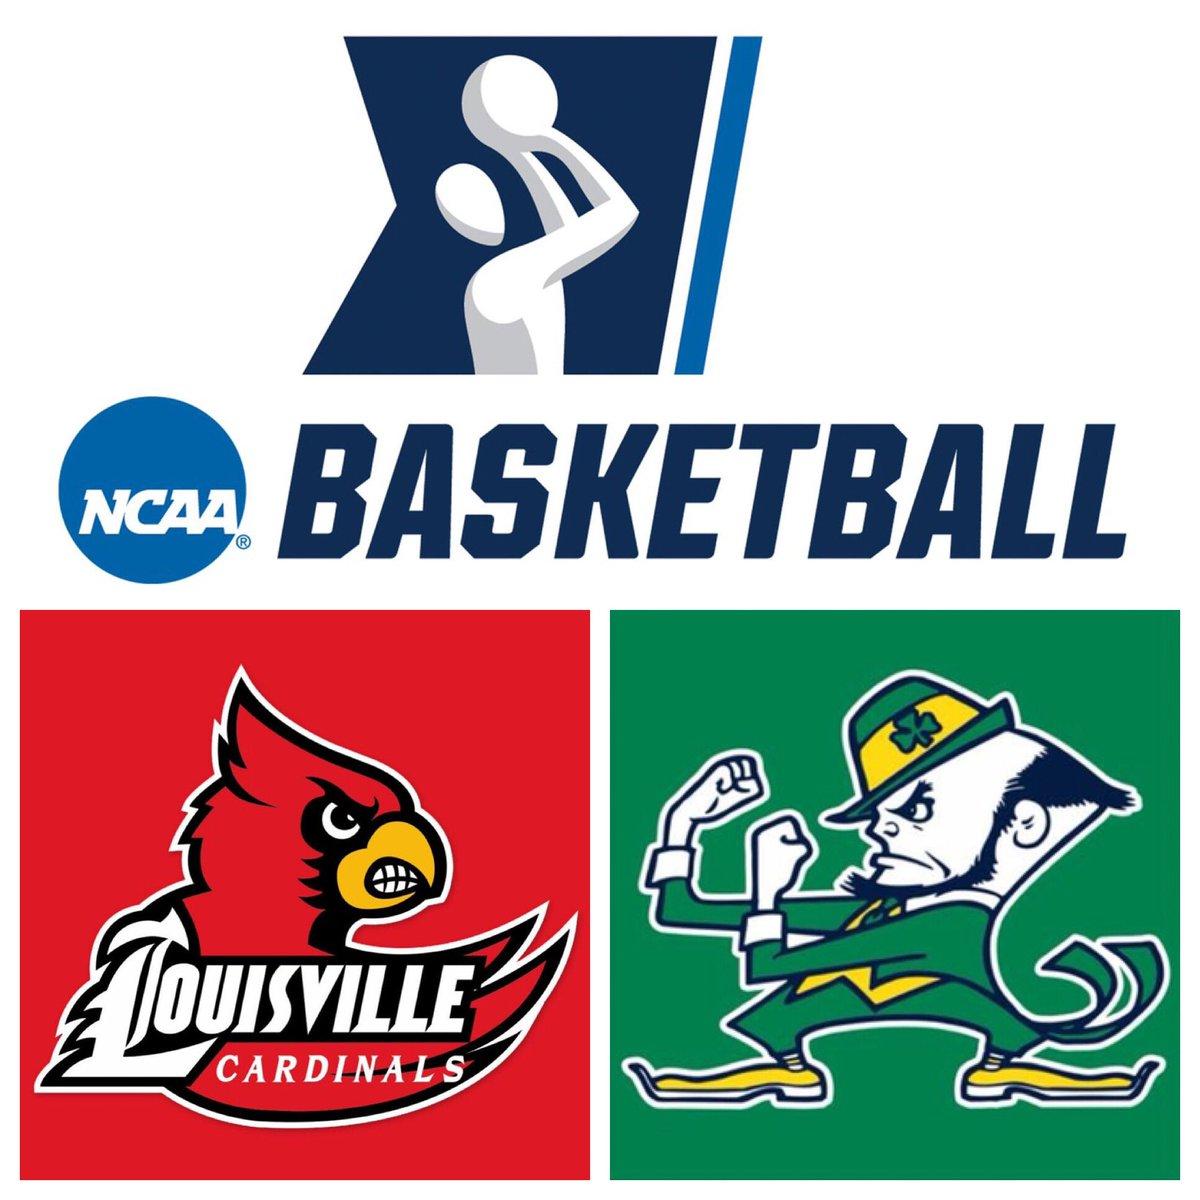 Ie Sports Radio On Twitter Spikesn 2 Louisville 1 Notredame